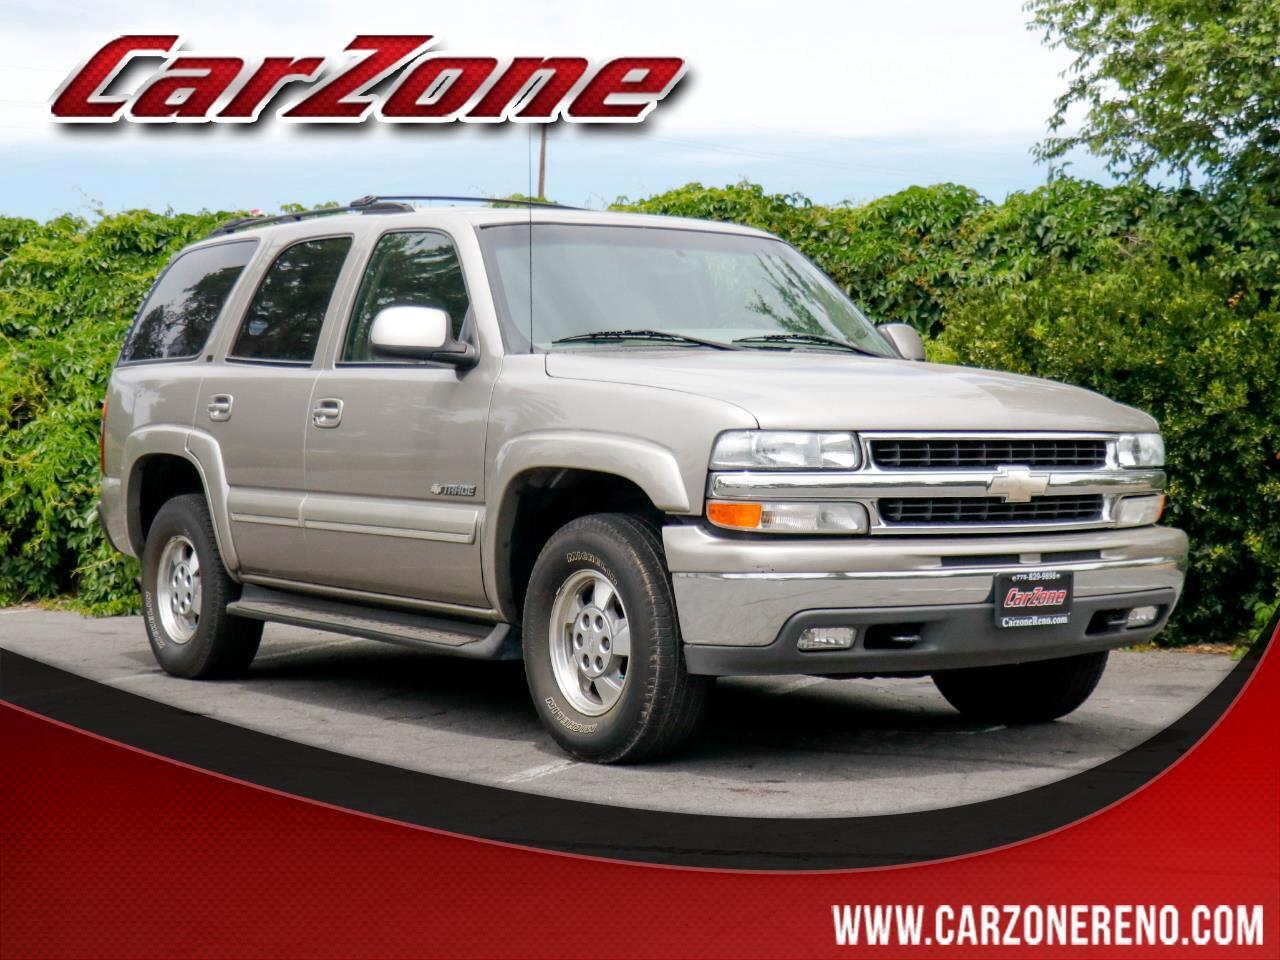 2003 Chevrolet Tahoe 4dr 1500 4WD LT